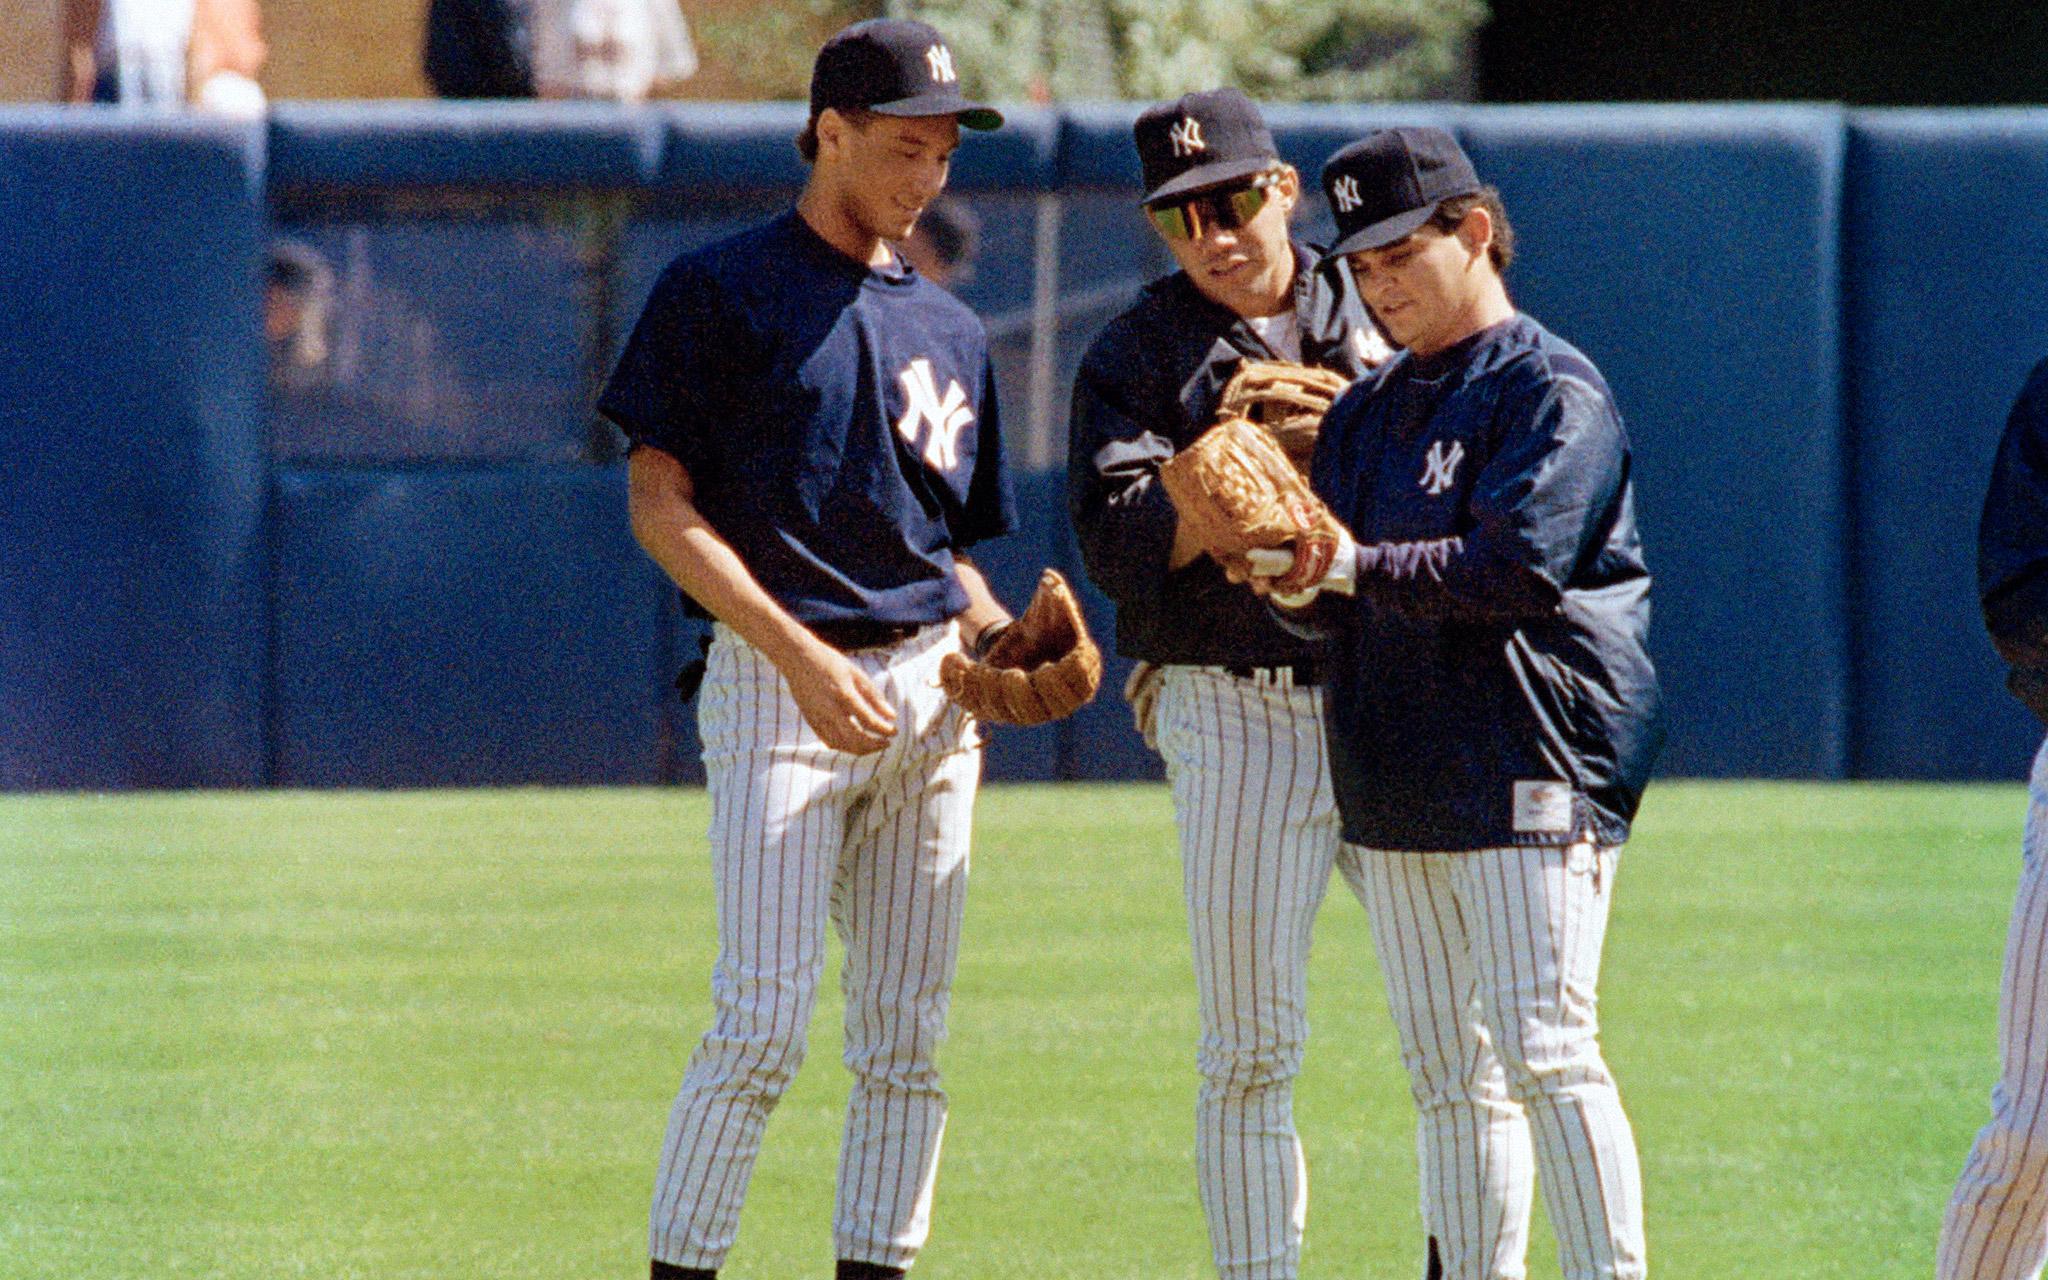 Derek Jeter's Career In Photos: The Draft